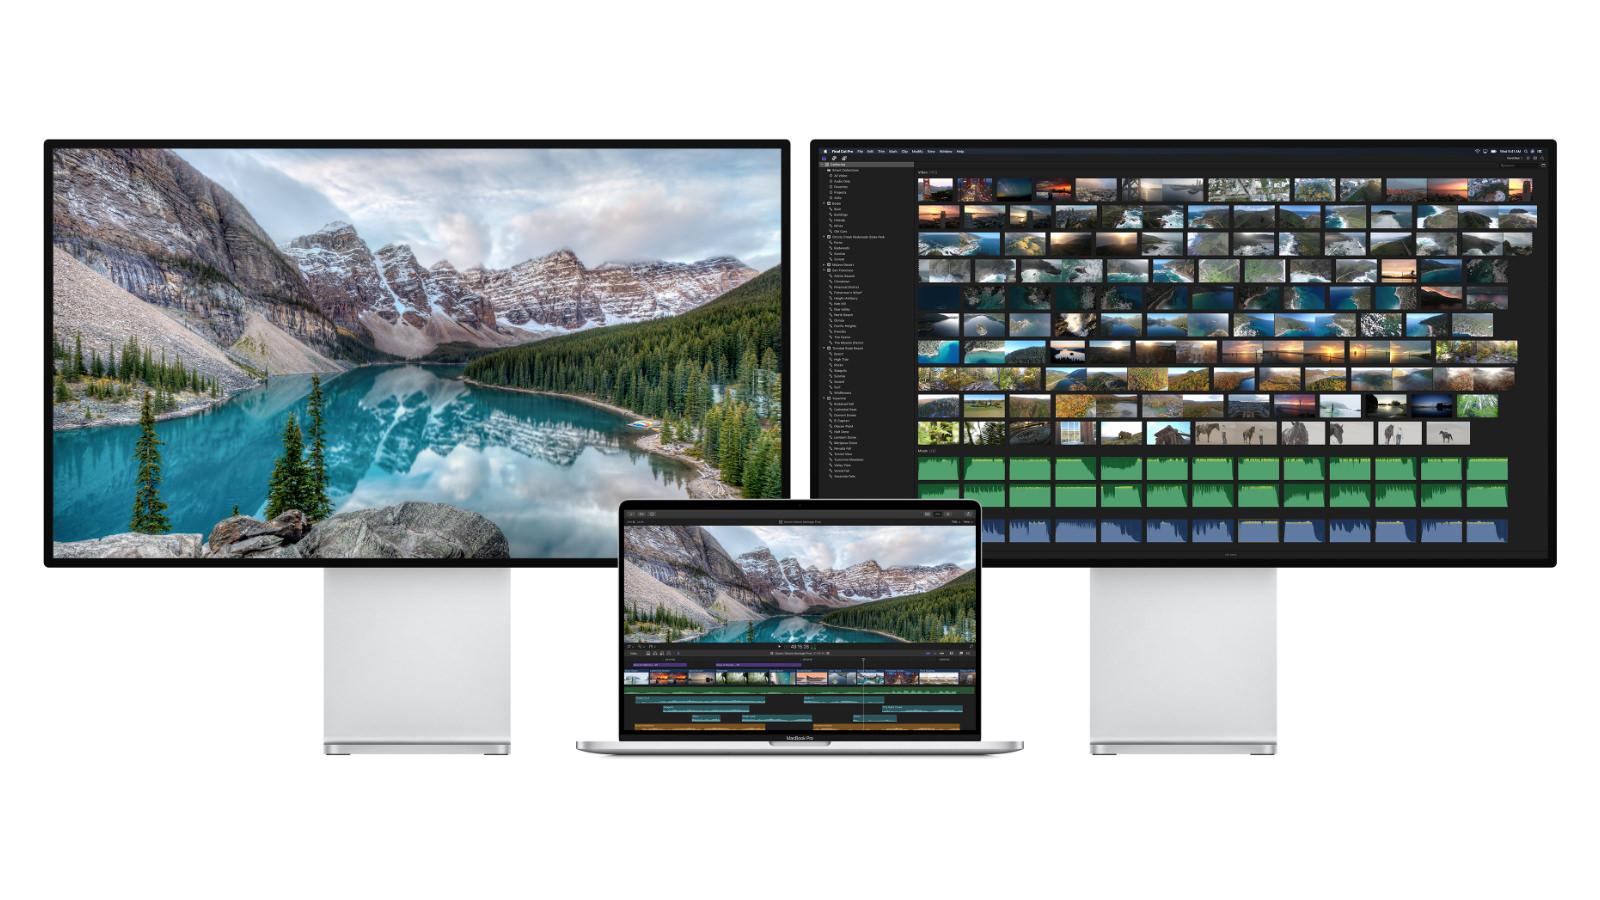 MacBookPro16inch two prodisplayxdr